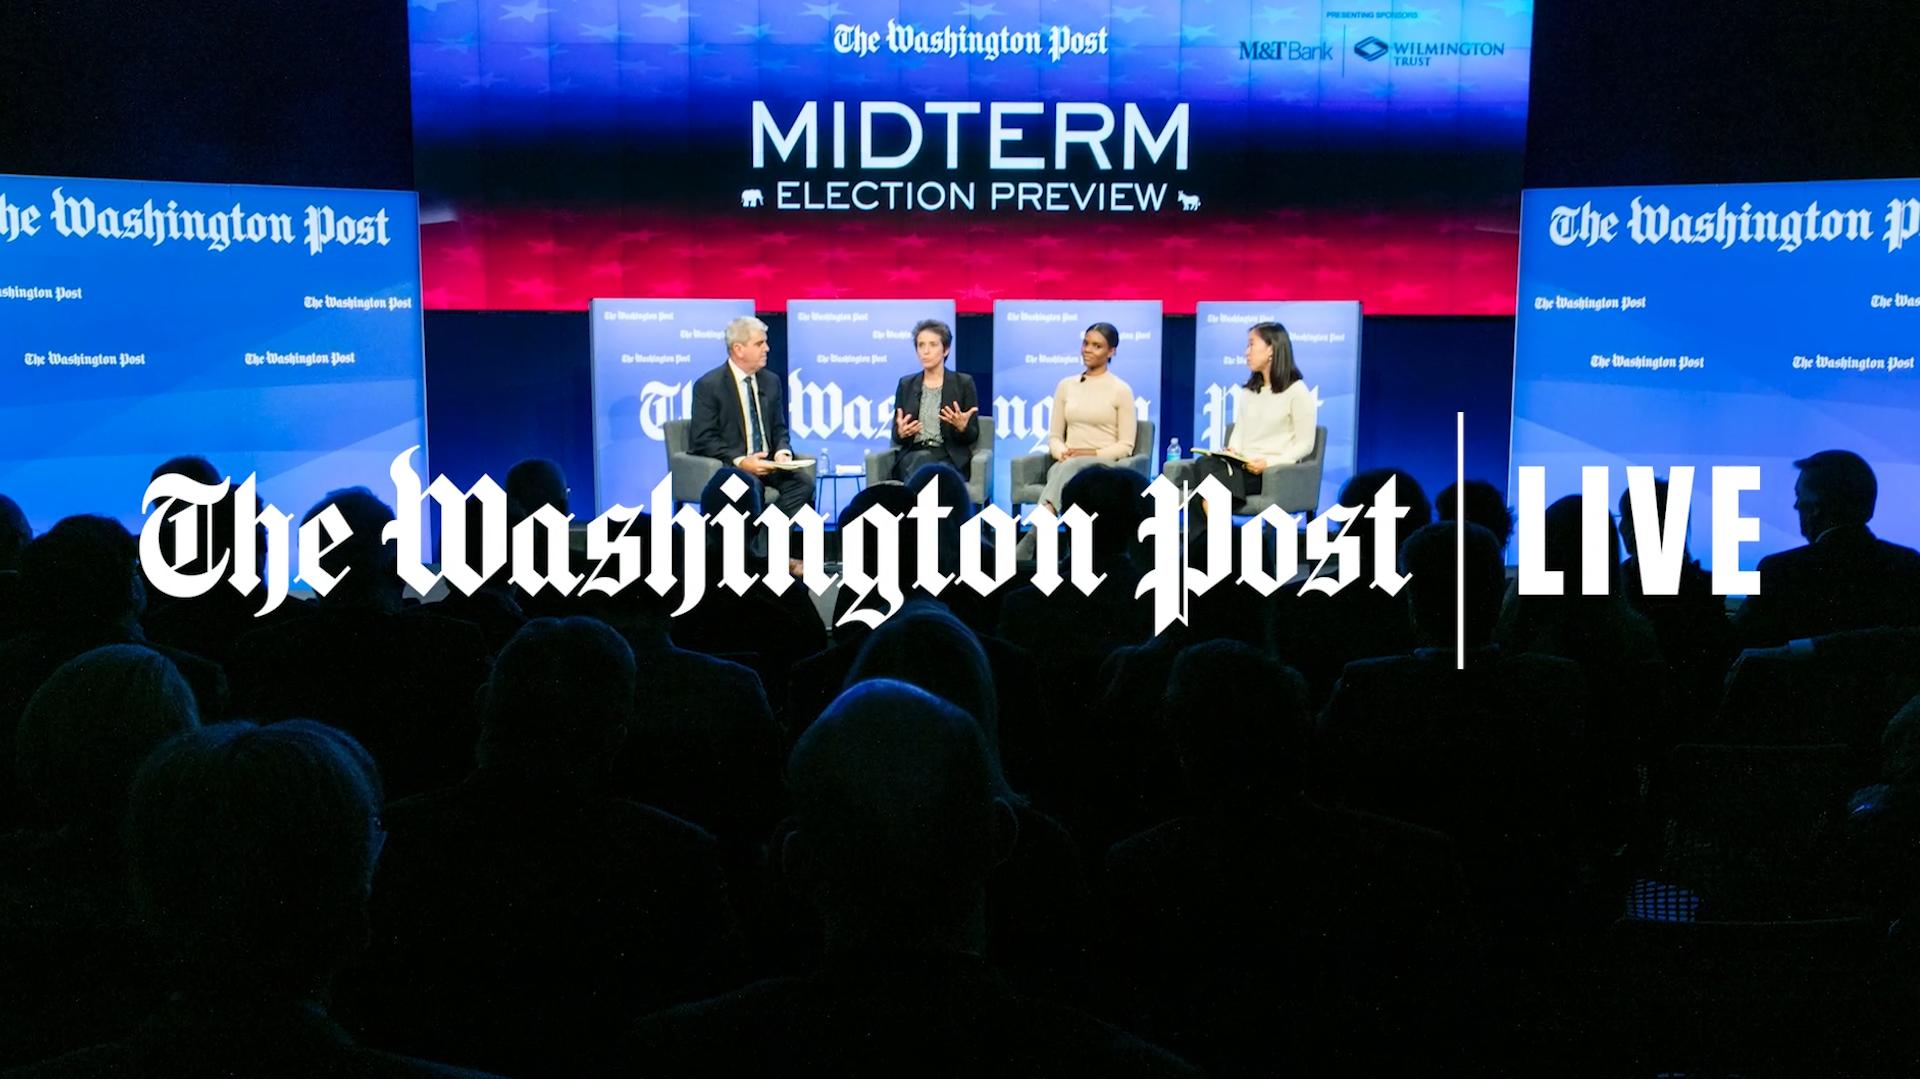 Washington Post Live - The Washington Post